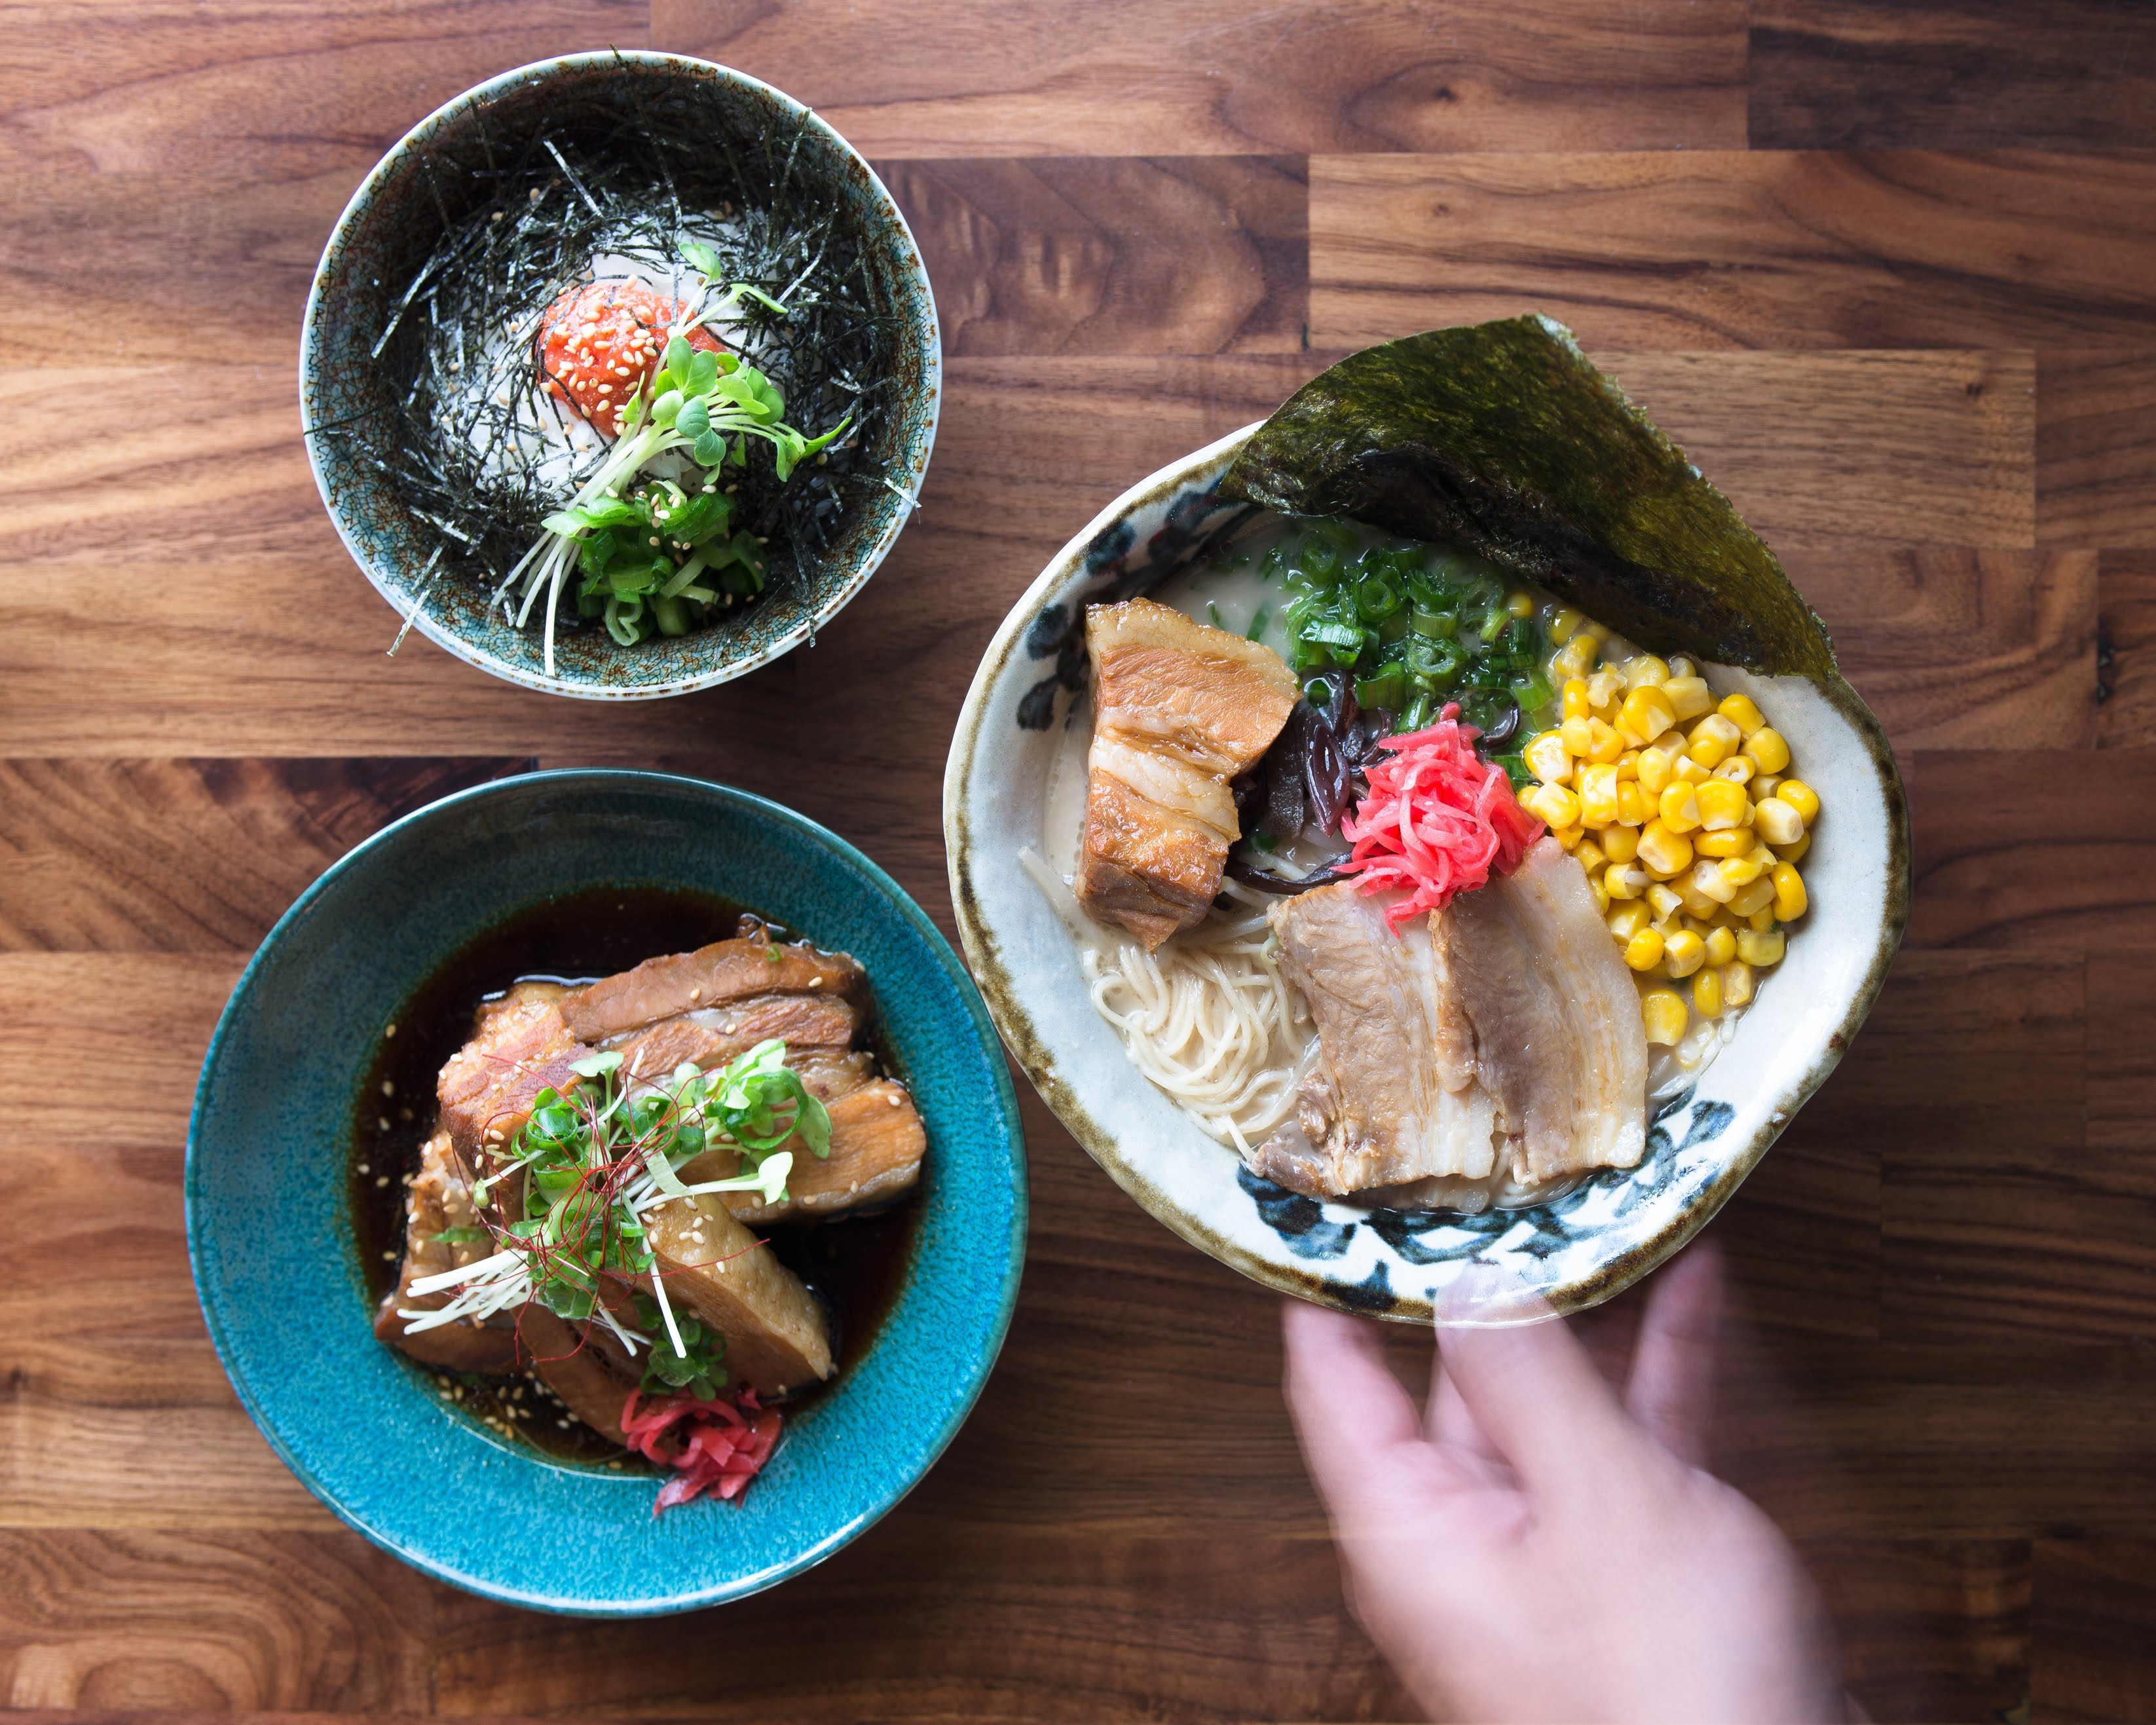 Bowls of ramen garnished with chashu pork, corn, and more from Marufuku Ramen